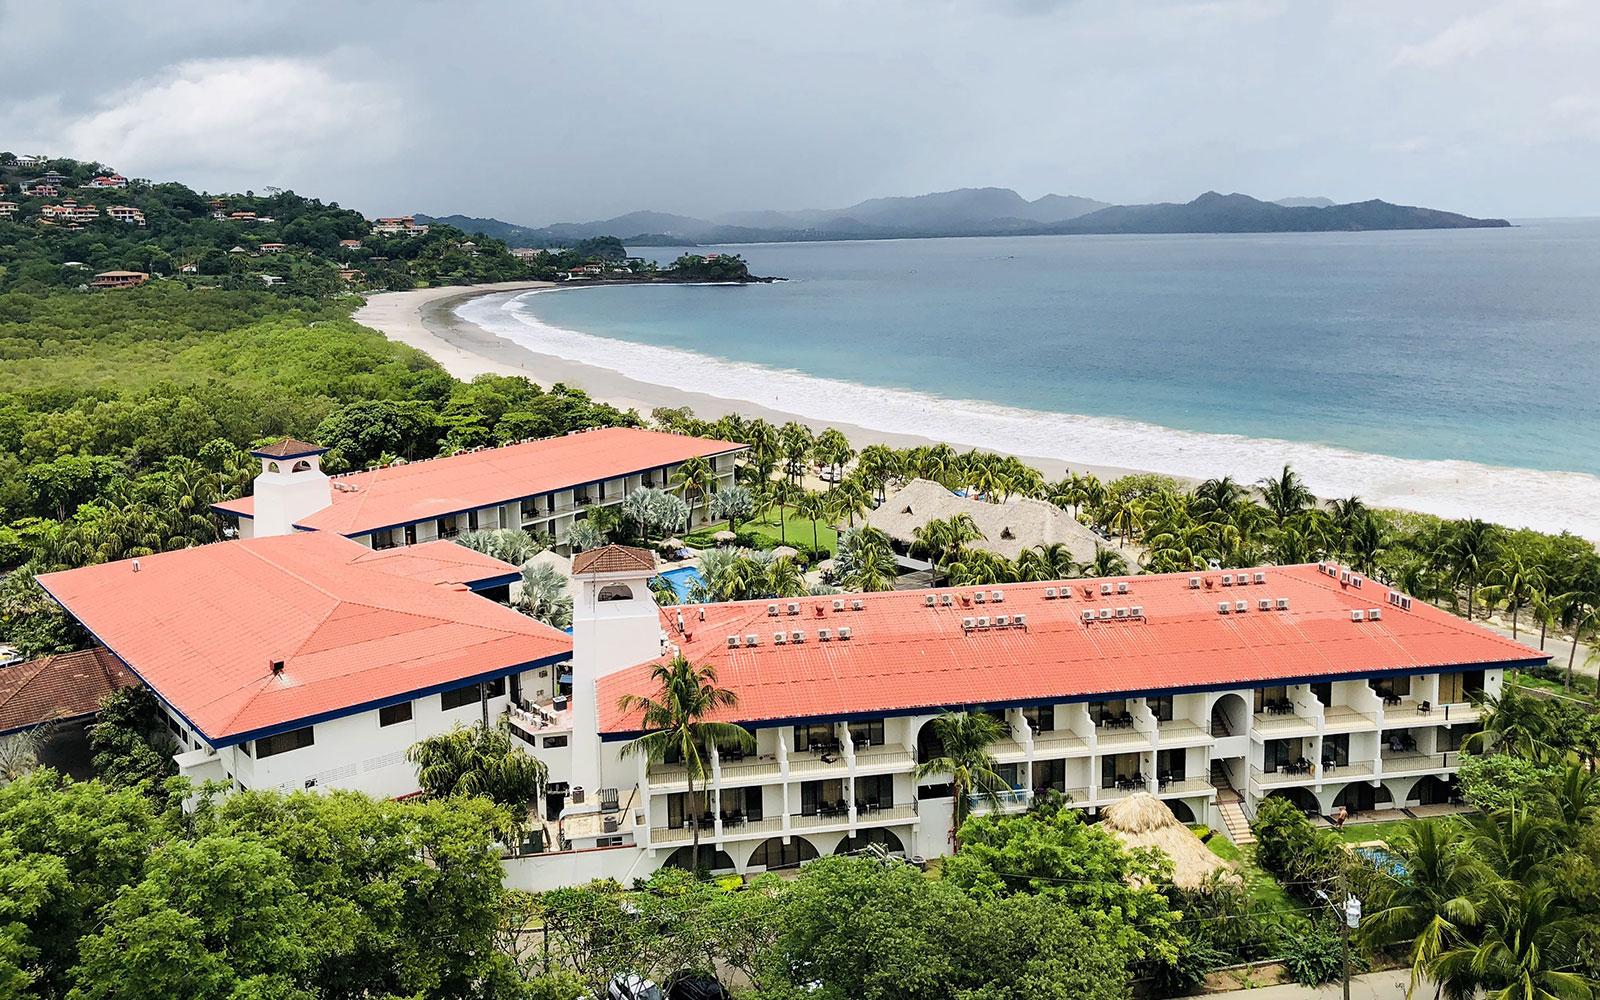 Margaritaville Beach Resort Playa Flamingo, Cost Rica